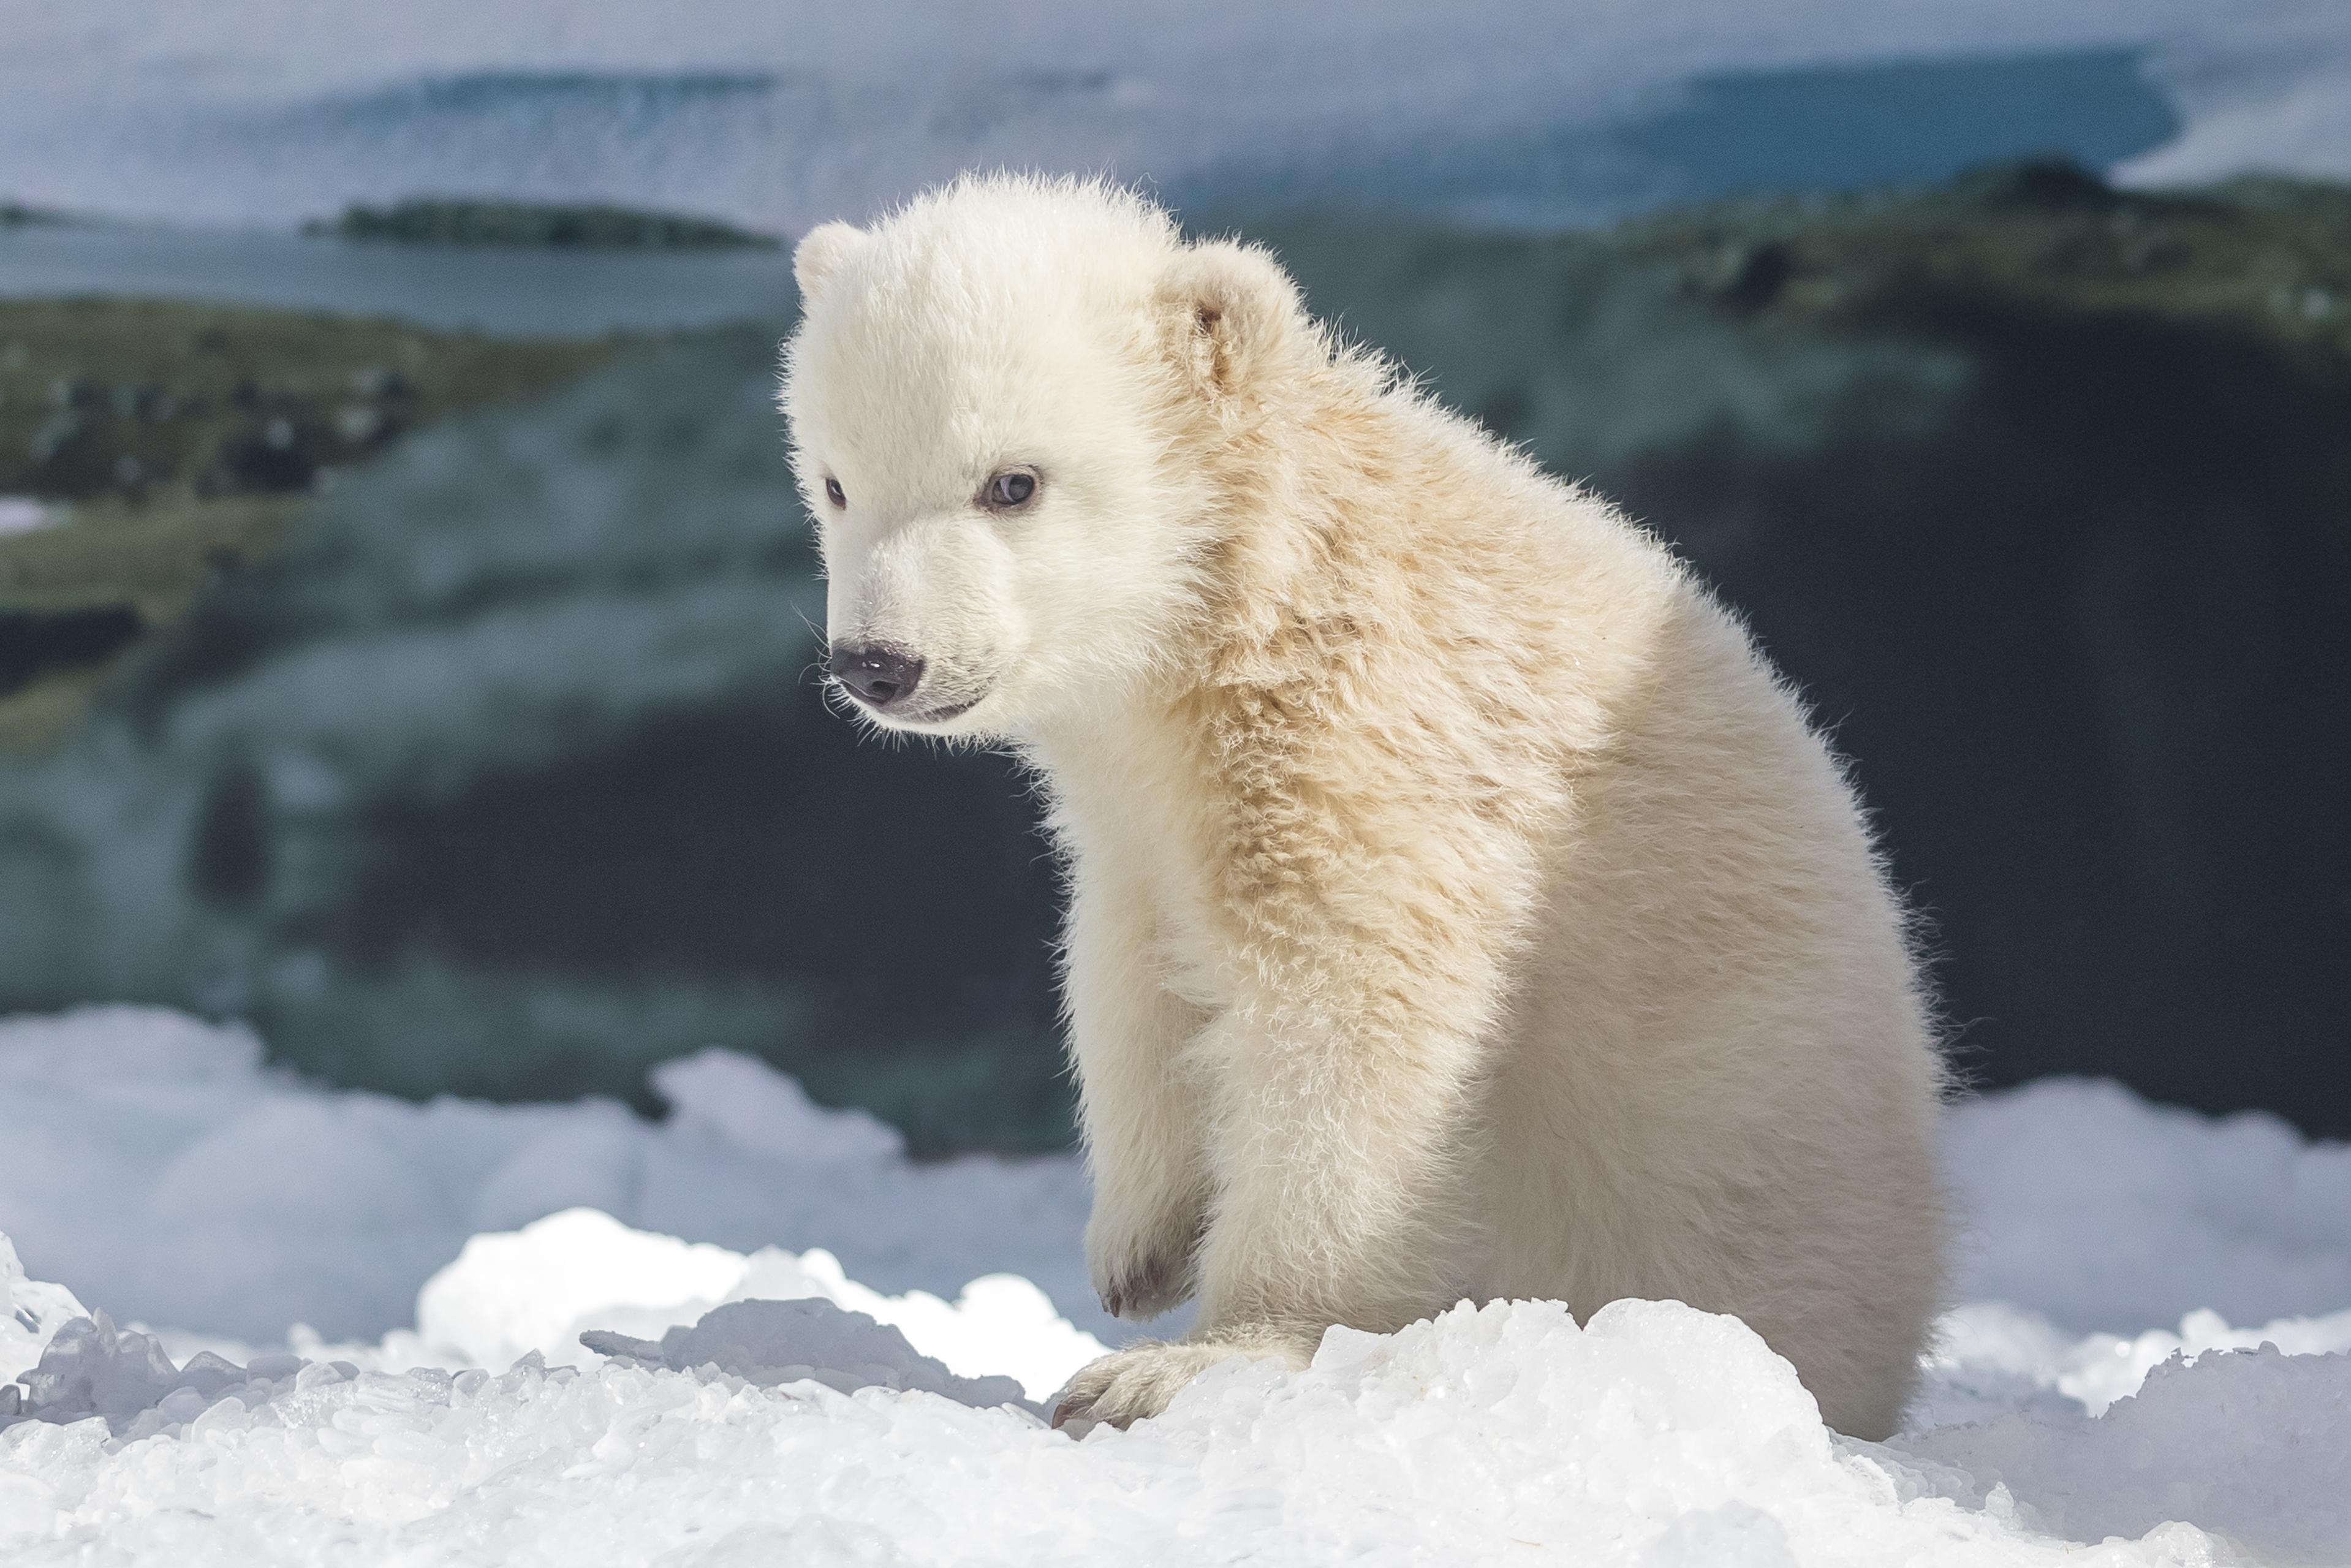 Mishka the polar bear cub